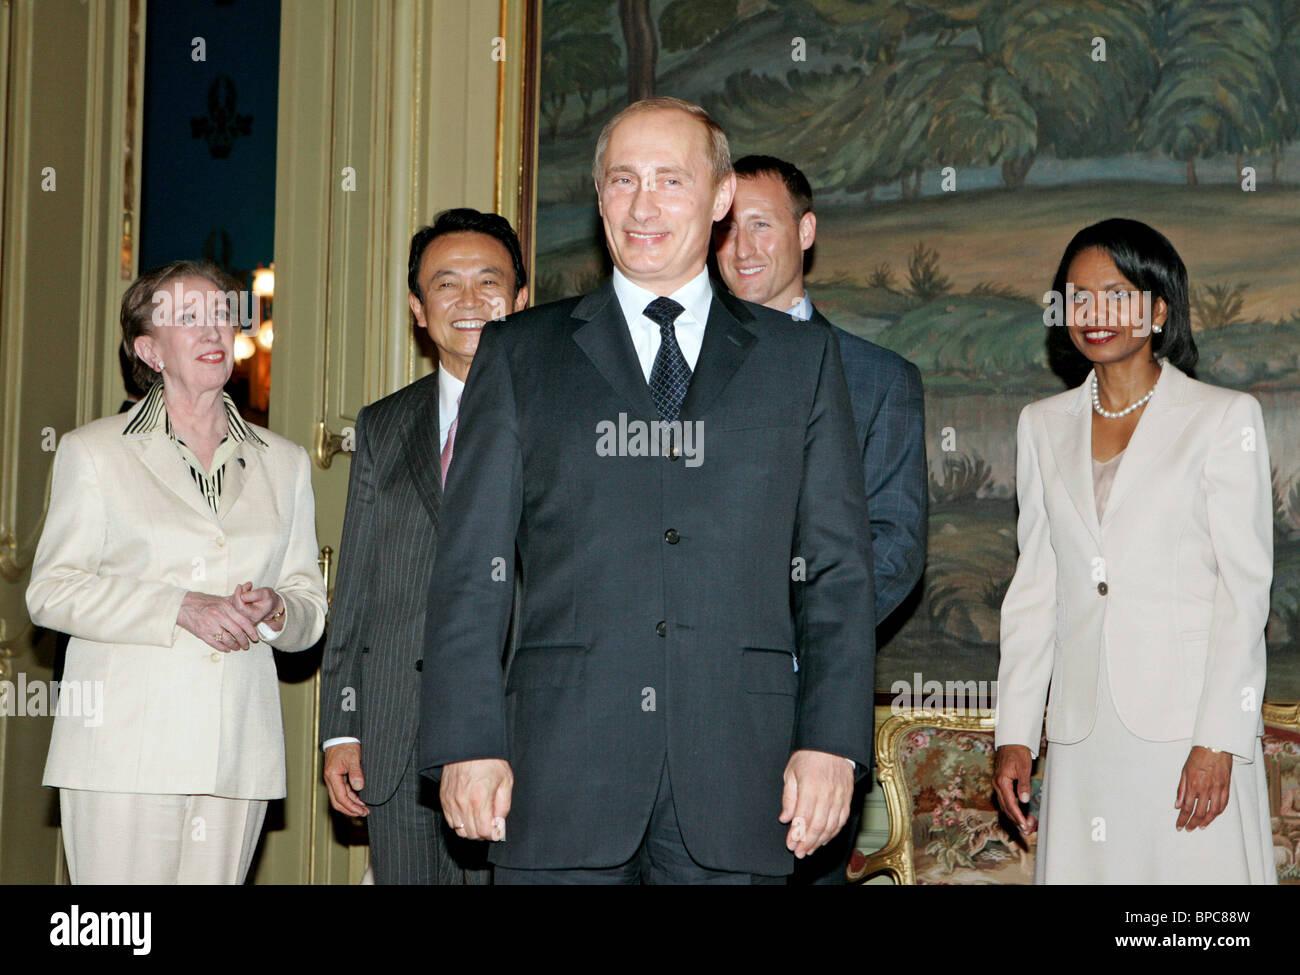 Russian President Vladimir Putin holds number of meetings on June 29, 2006 Stock Photo